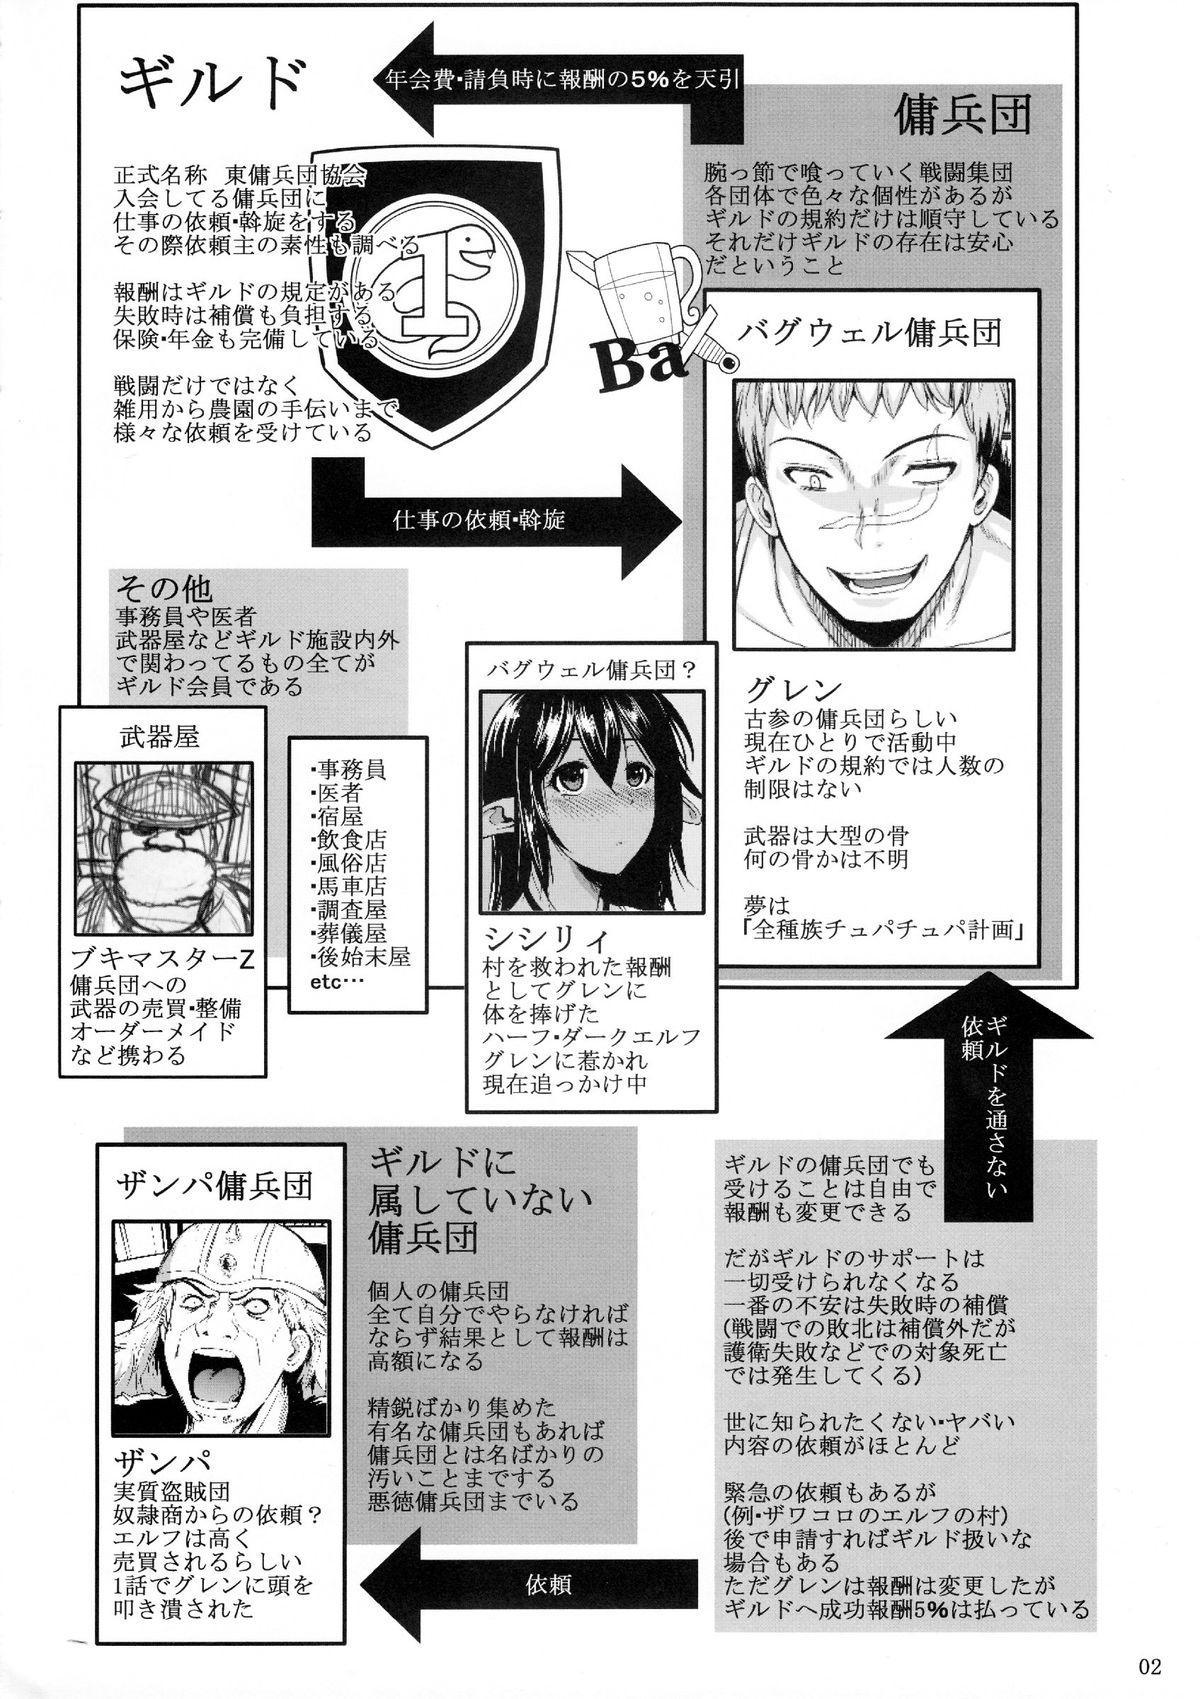 Tatta Hitori no Youheidan 2 | One-Man Mercenary Army 2 2